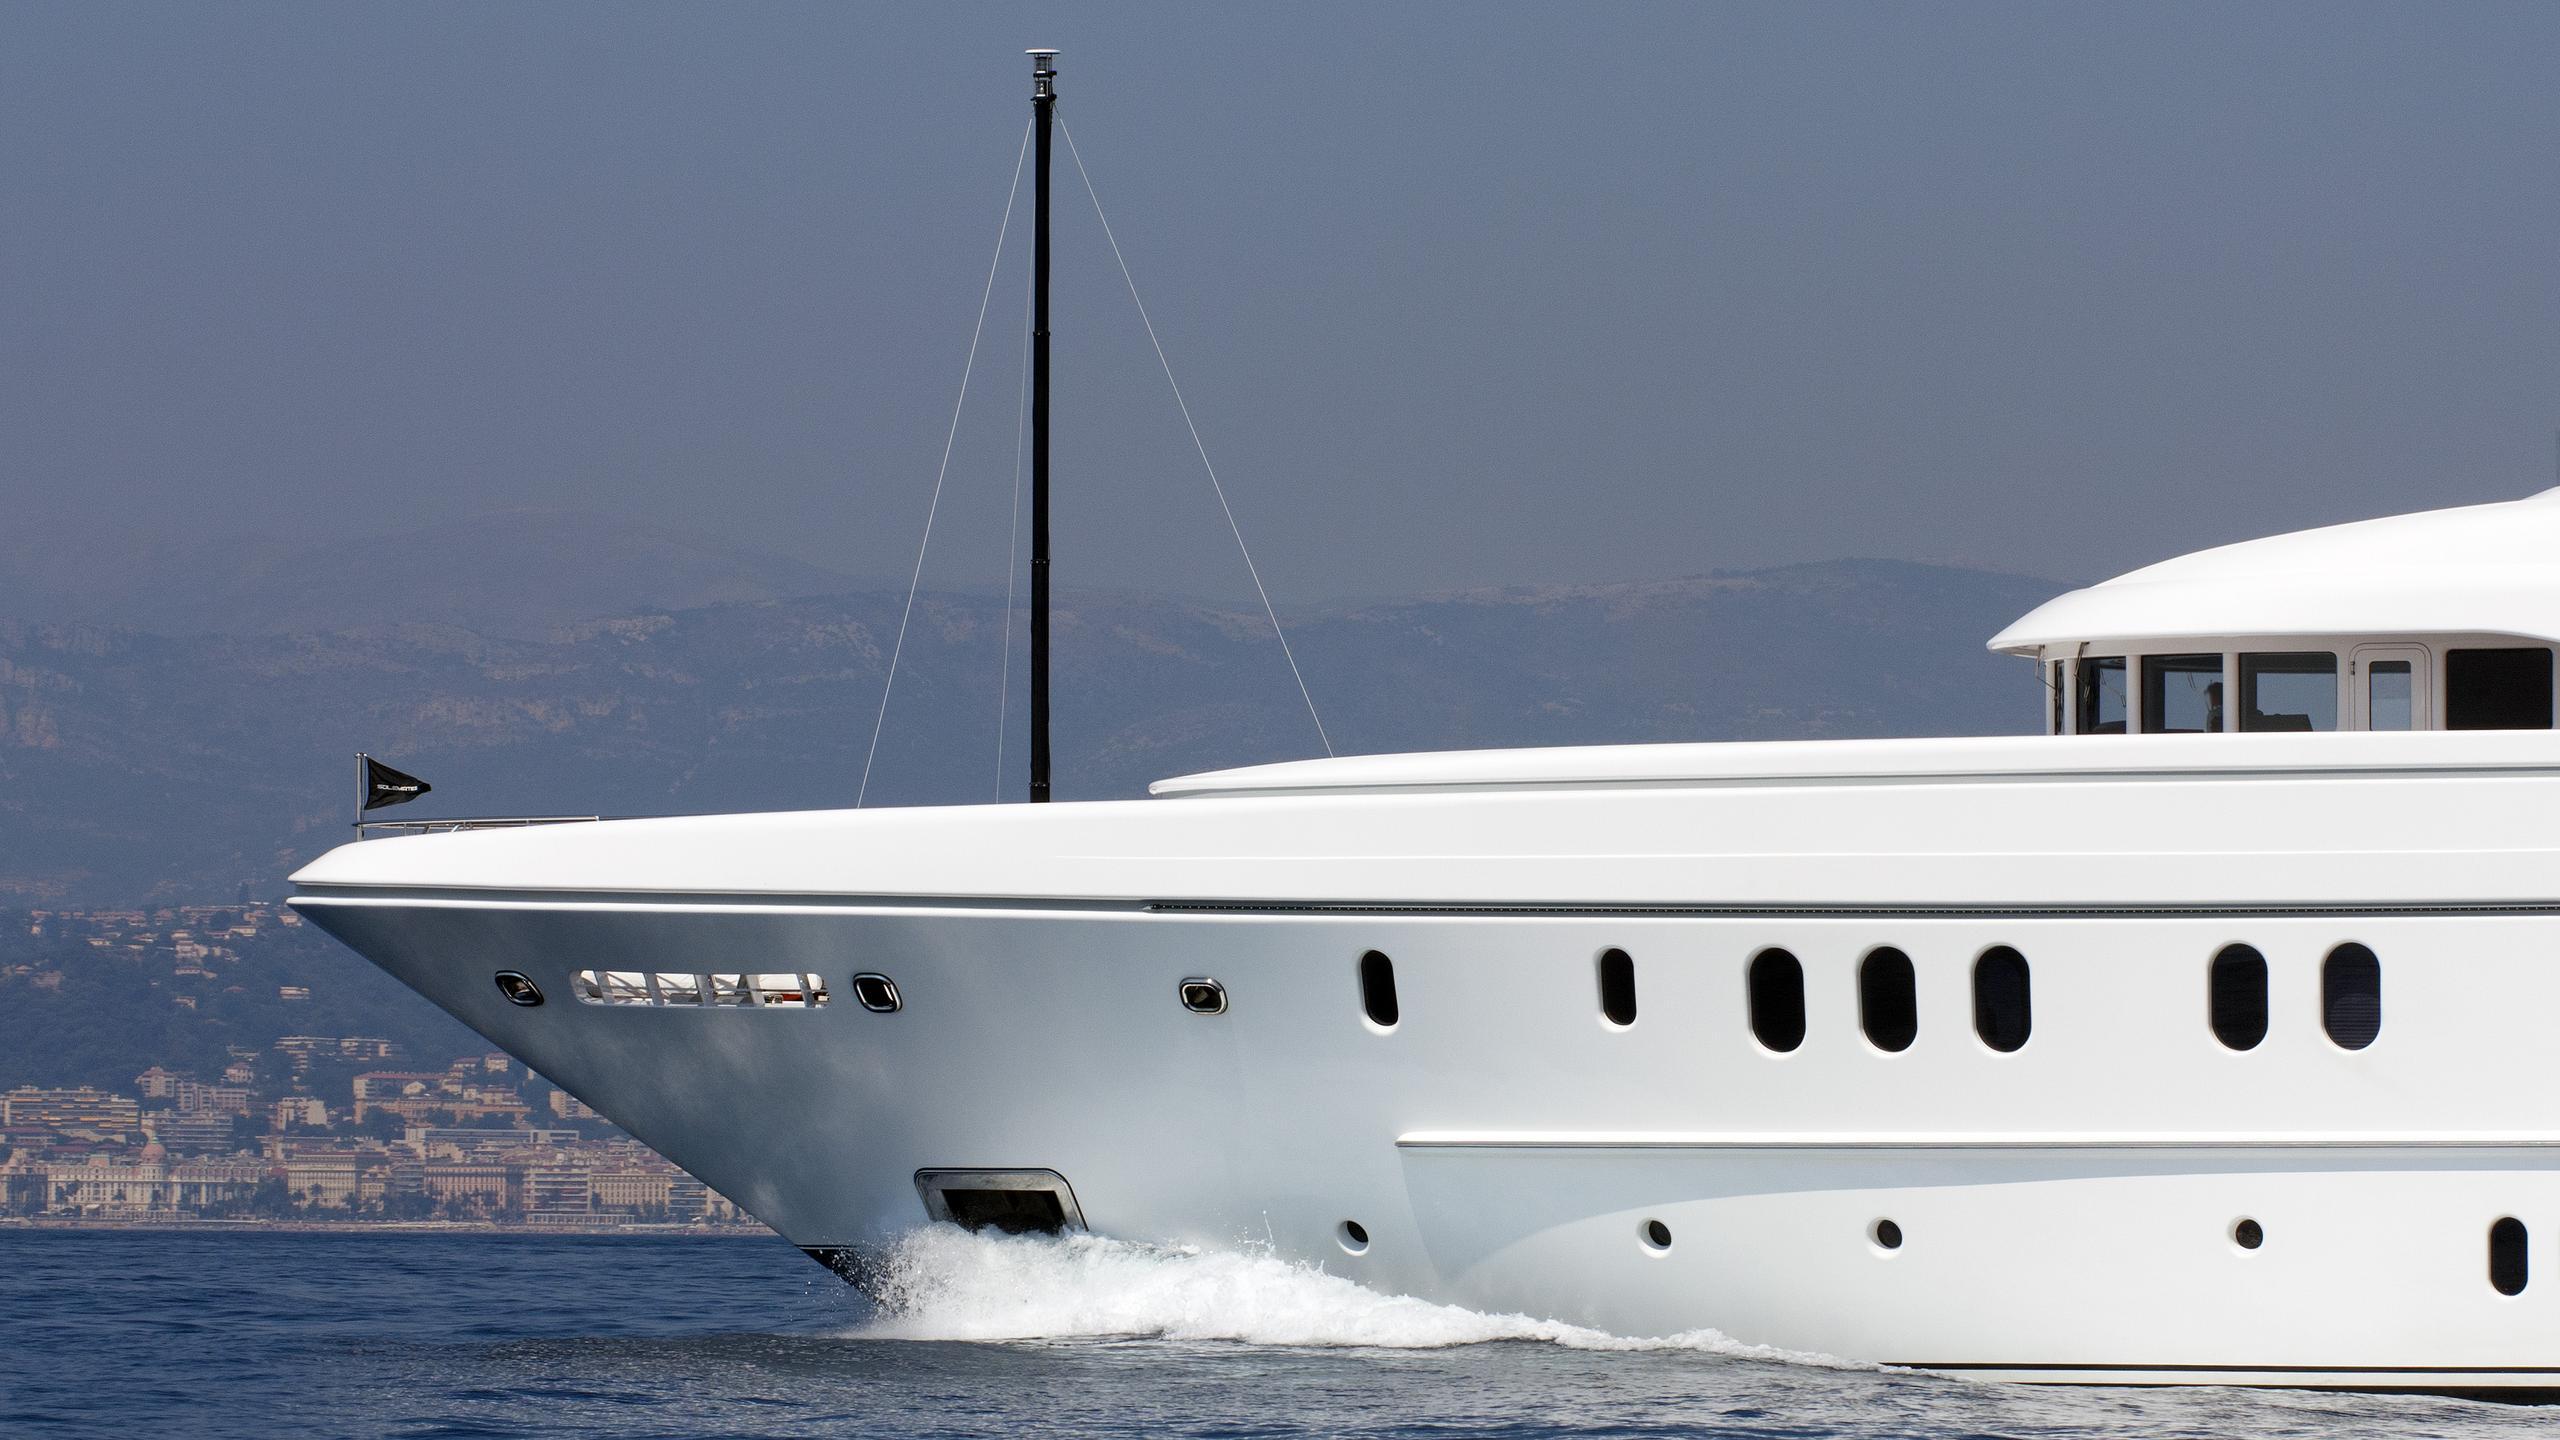 huntress-motor-yacht-lurssen-2010-60m-stern-detail